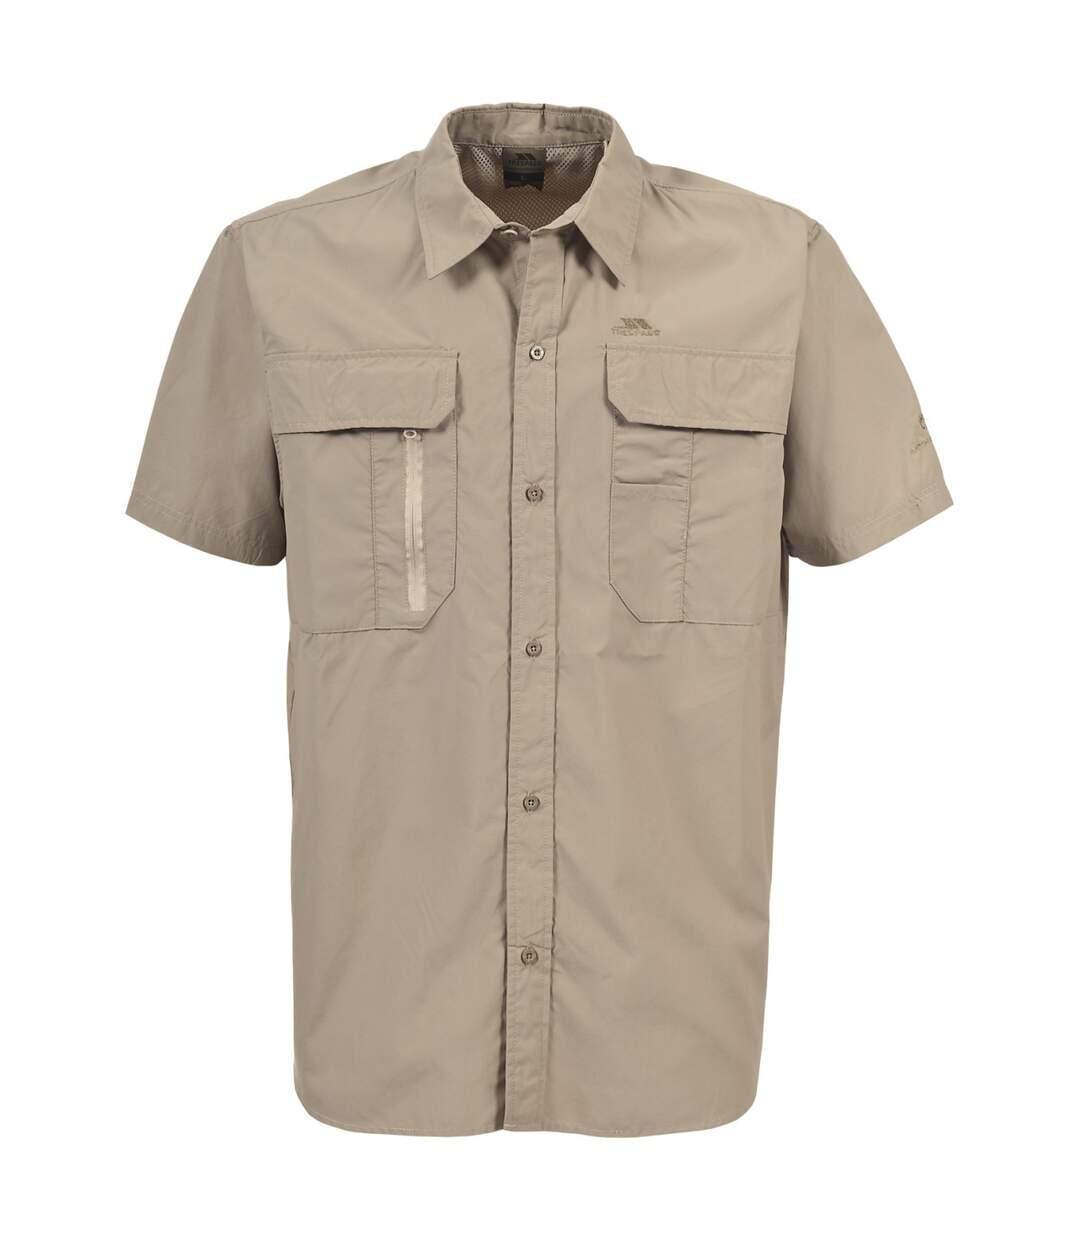 Trespass Mens Colly Short Sleeve Quick Dry Shirt (Bamboo) - UTTP331